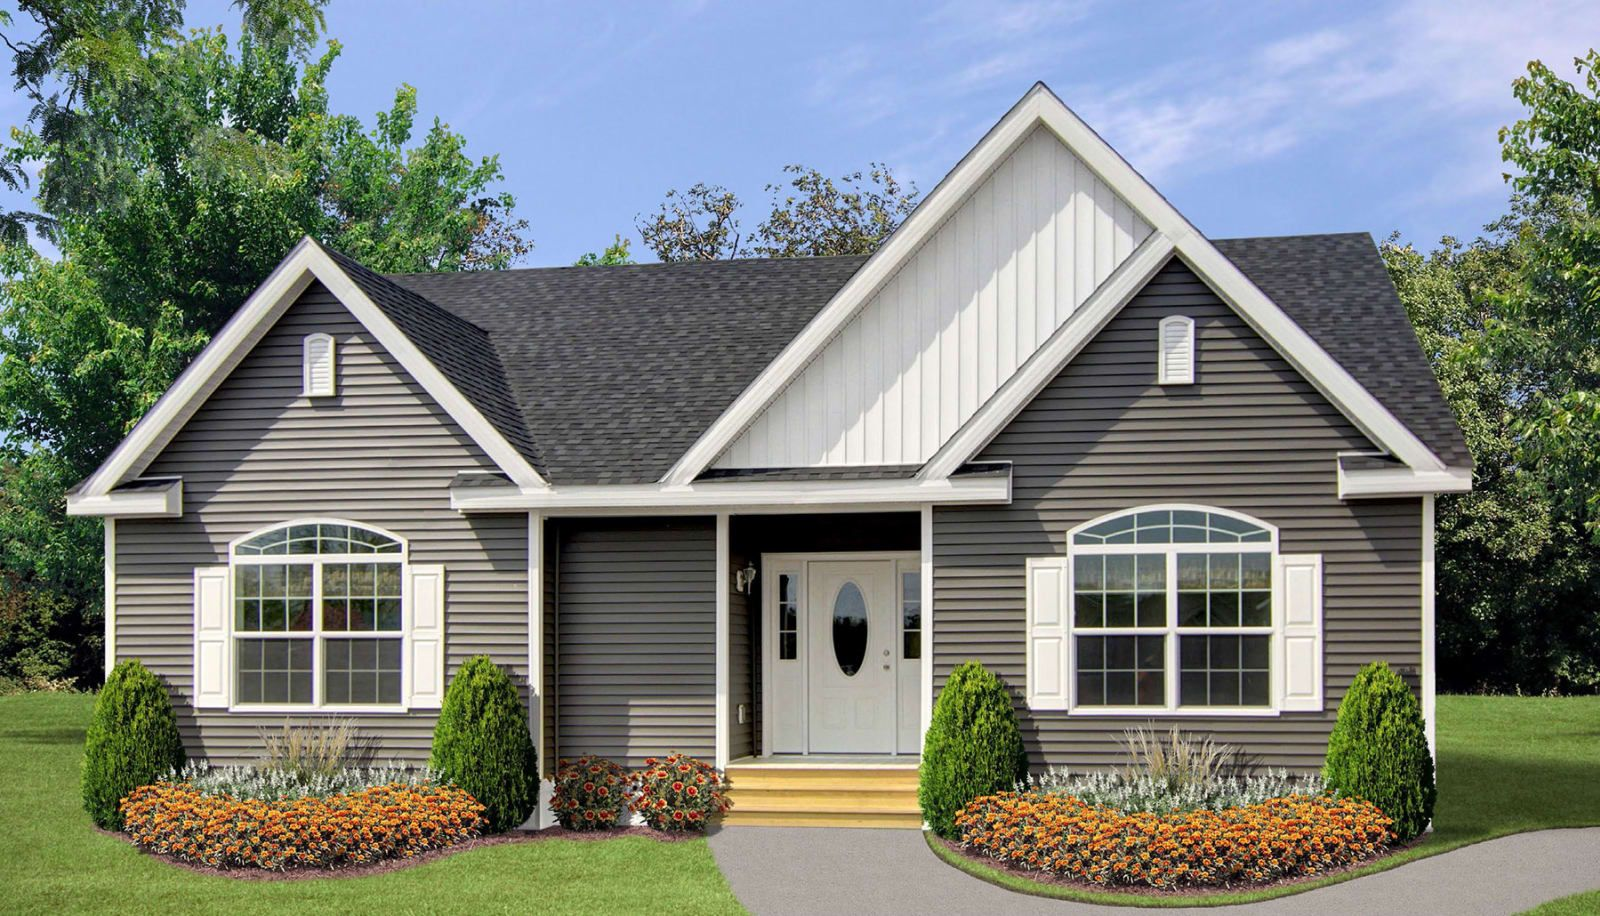 Charleston exterior modular homes image house modular